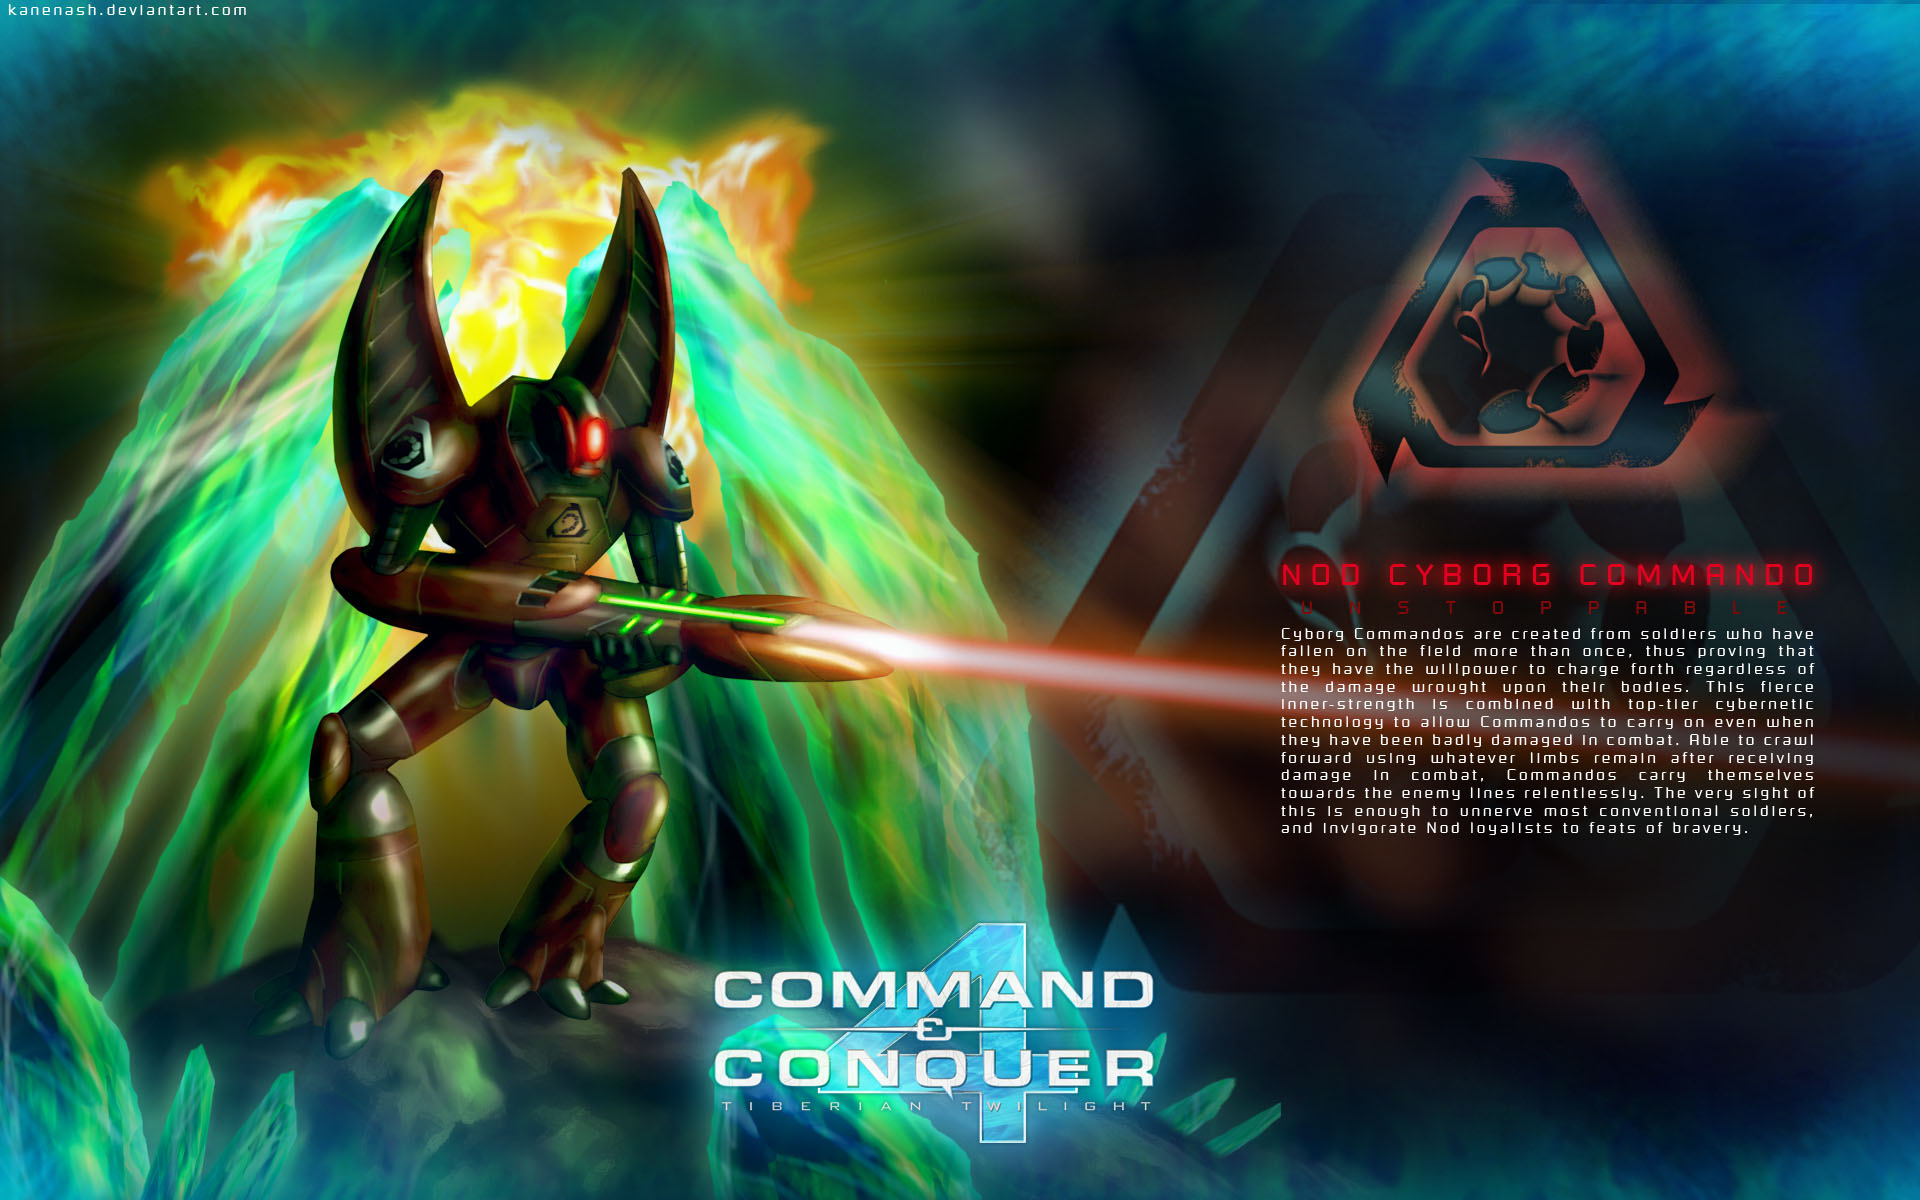 Nod_Cyborg_Commando_by_KaneNash.jpg